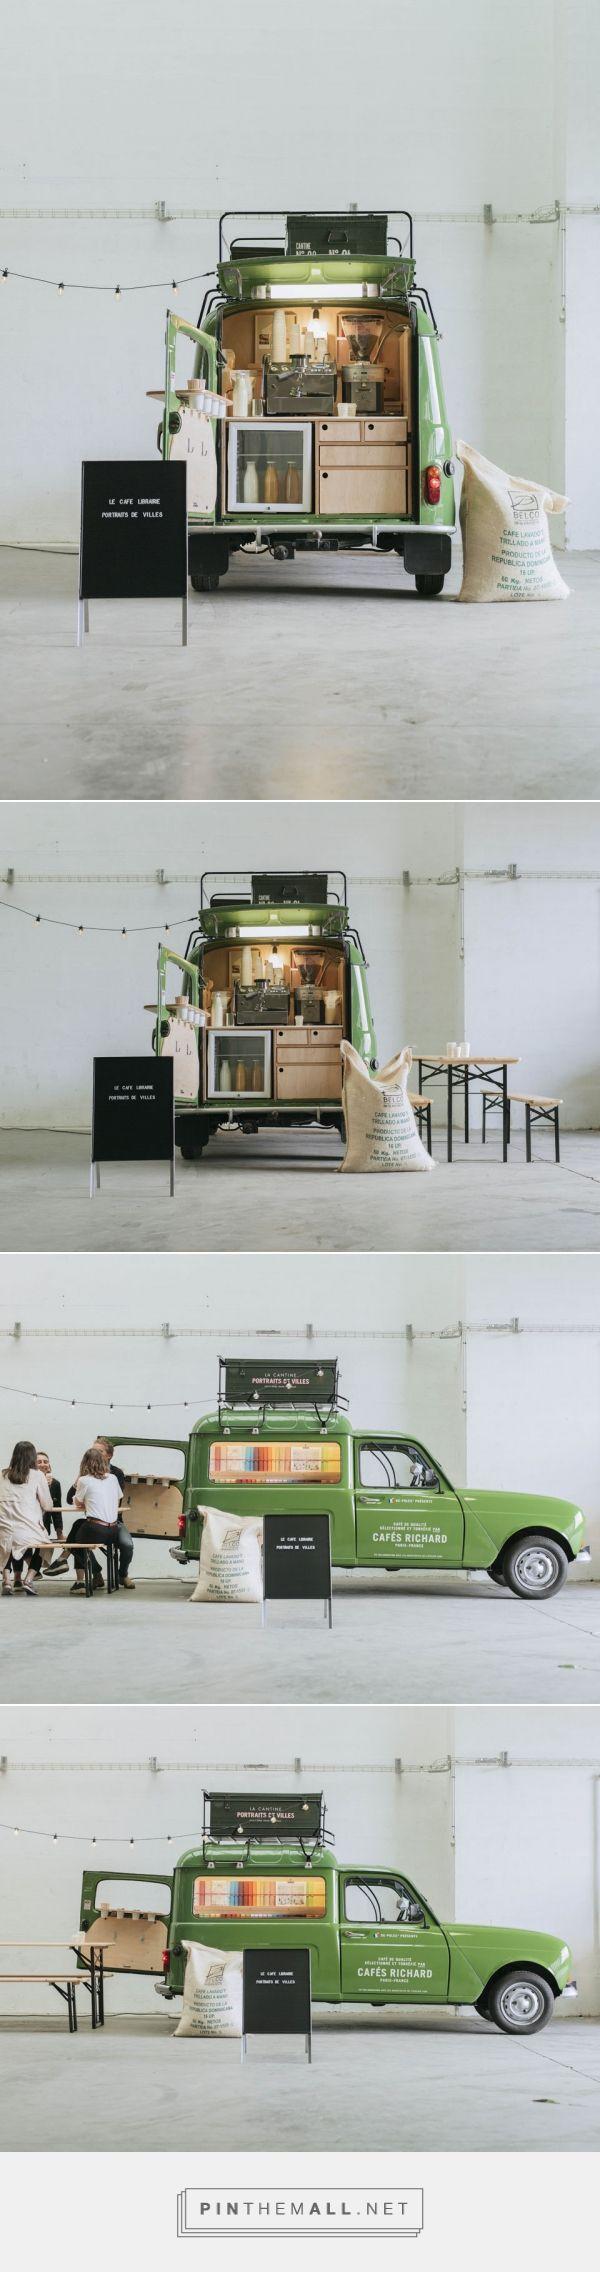 4L librairie-café   MilK decoration - created via https://pinthemall.net